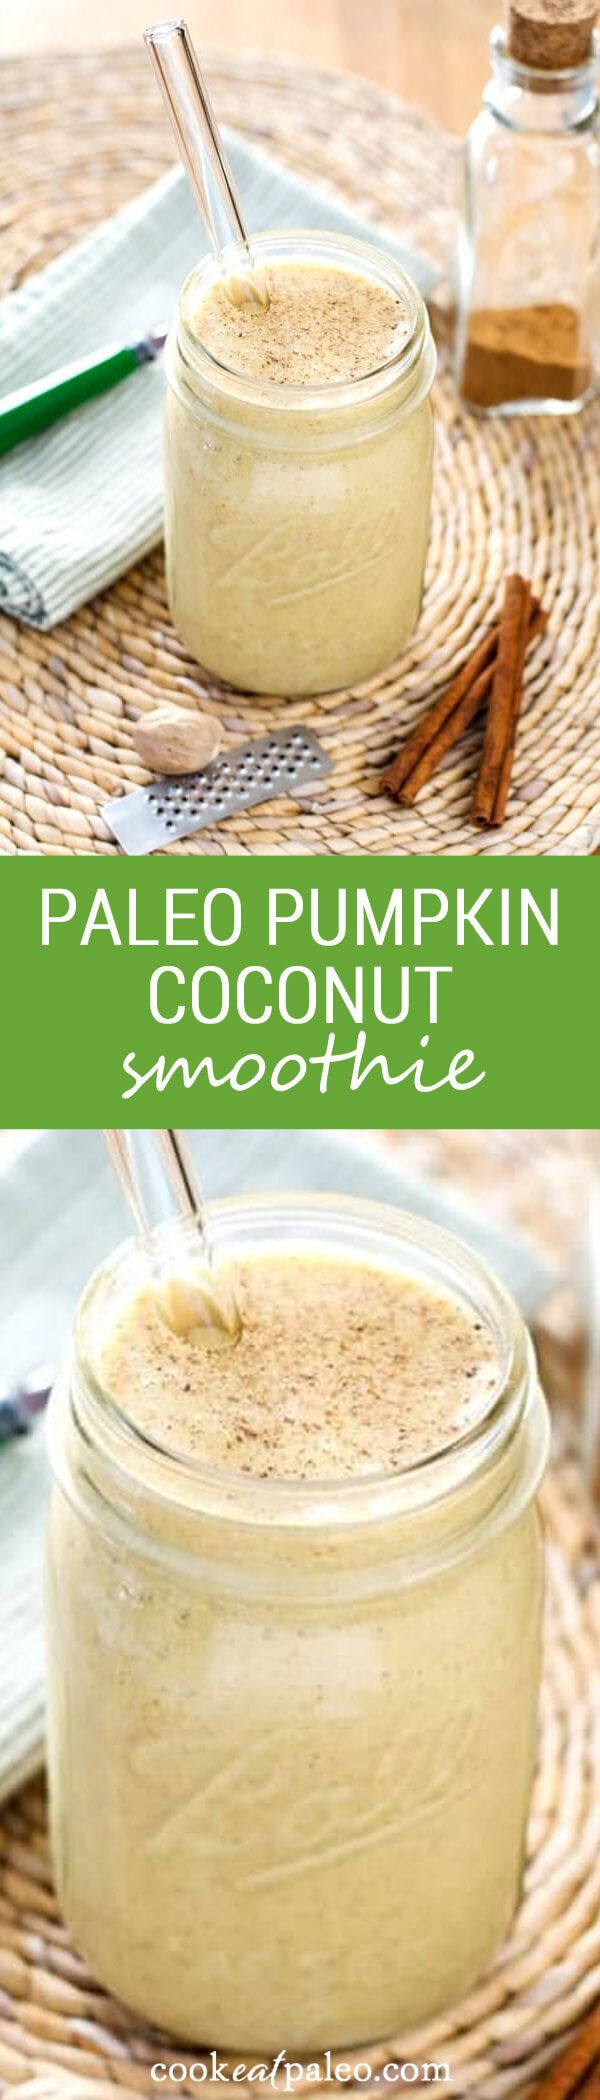 Paleo Breakfast Smoothies  Paleo Pumpkin Coconut Smoothie Recipe